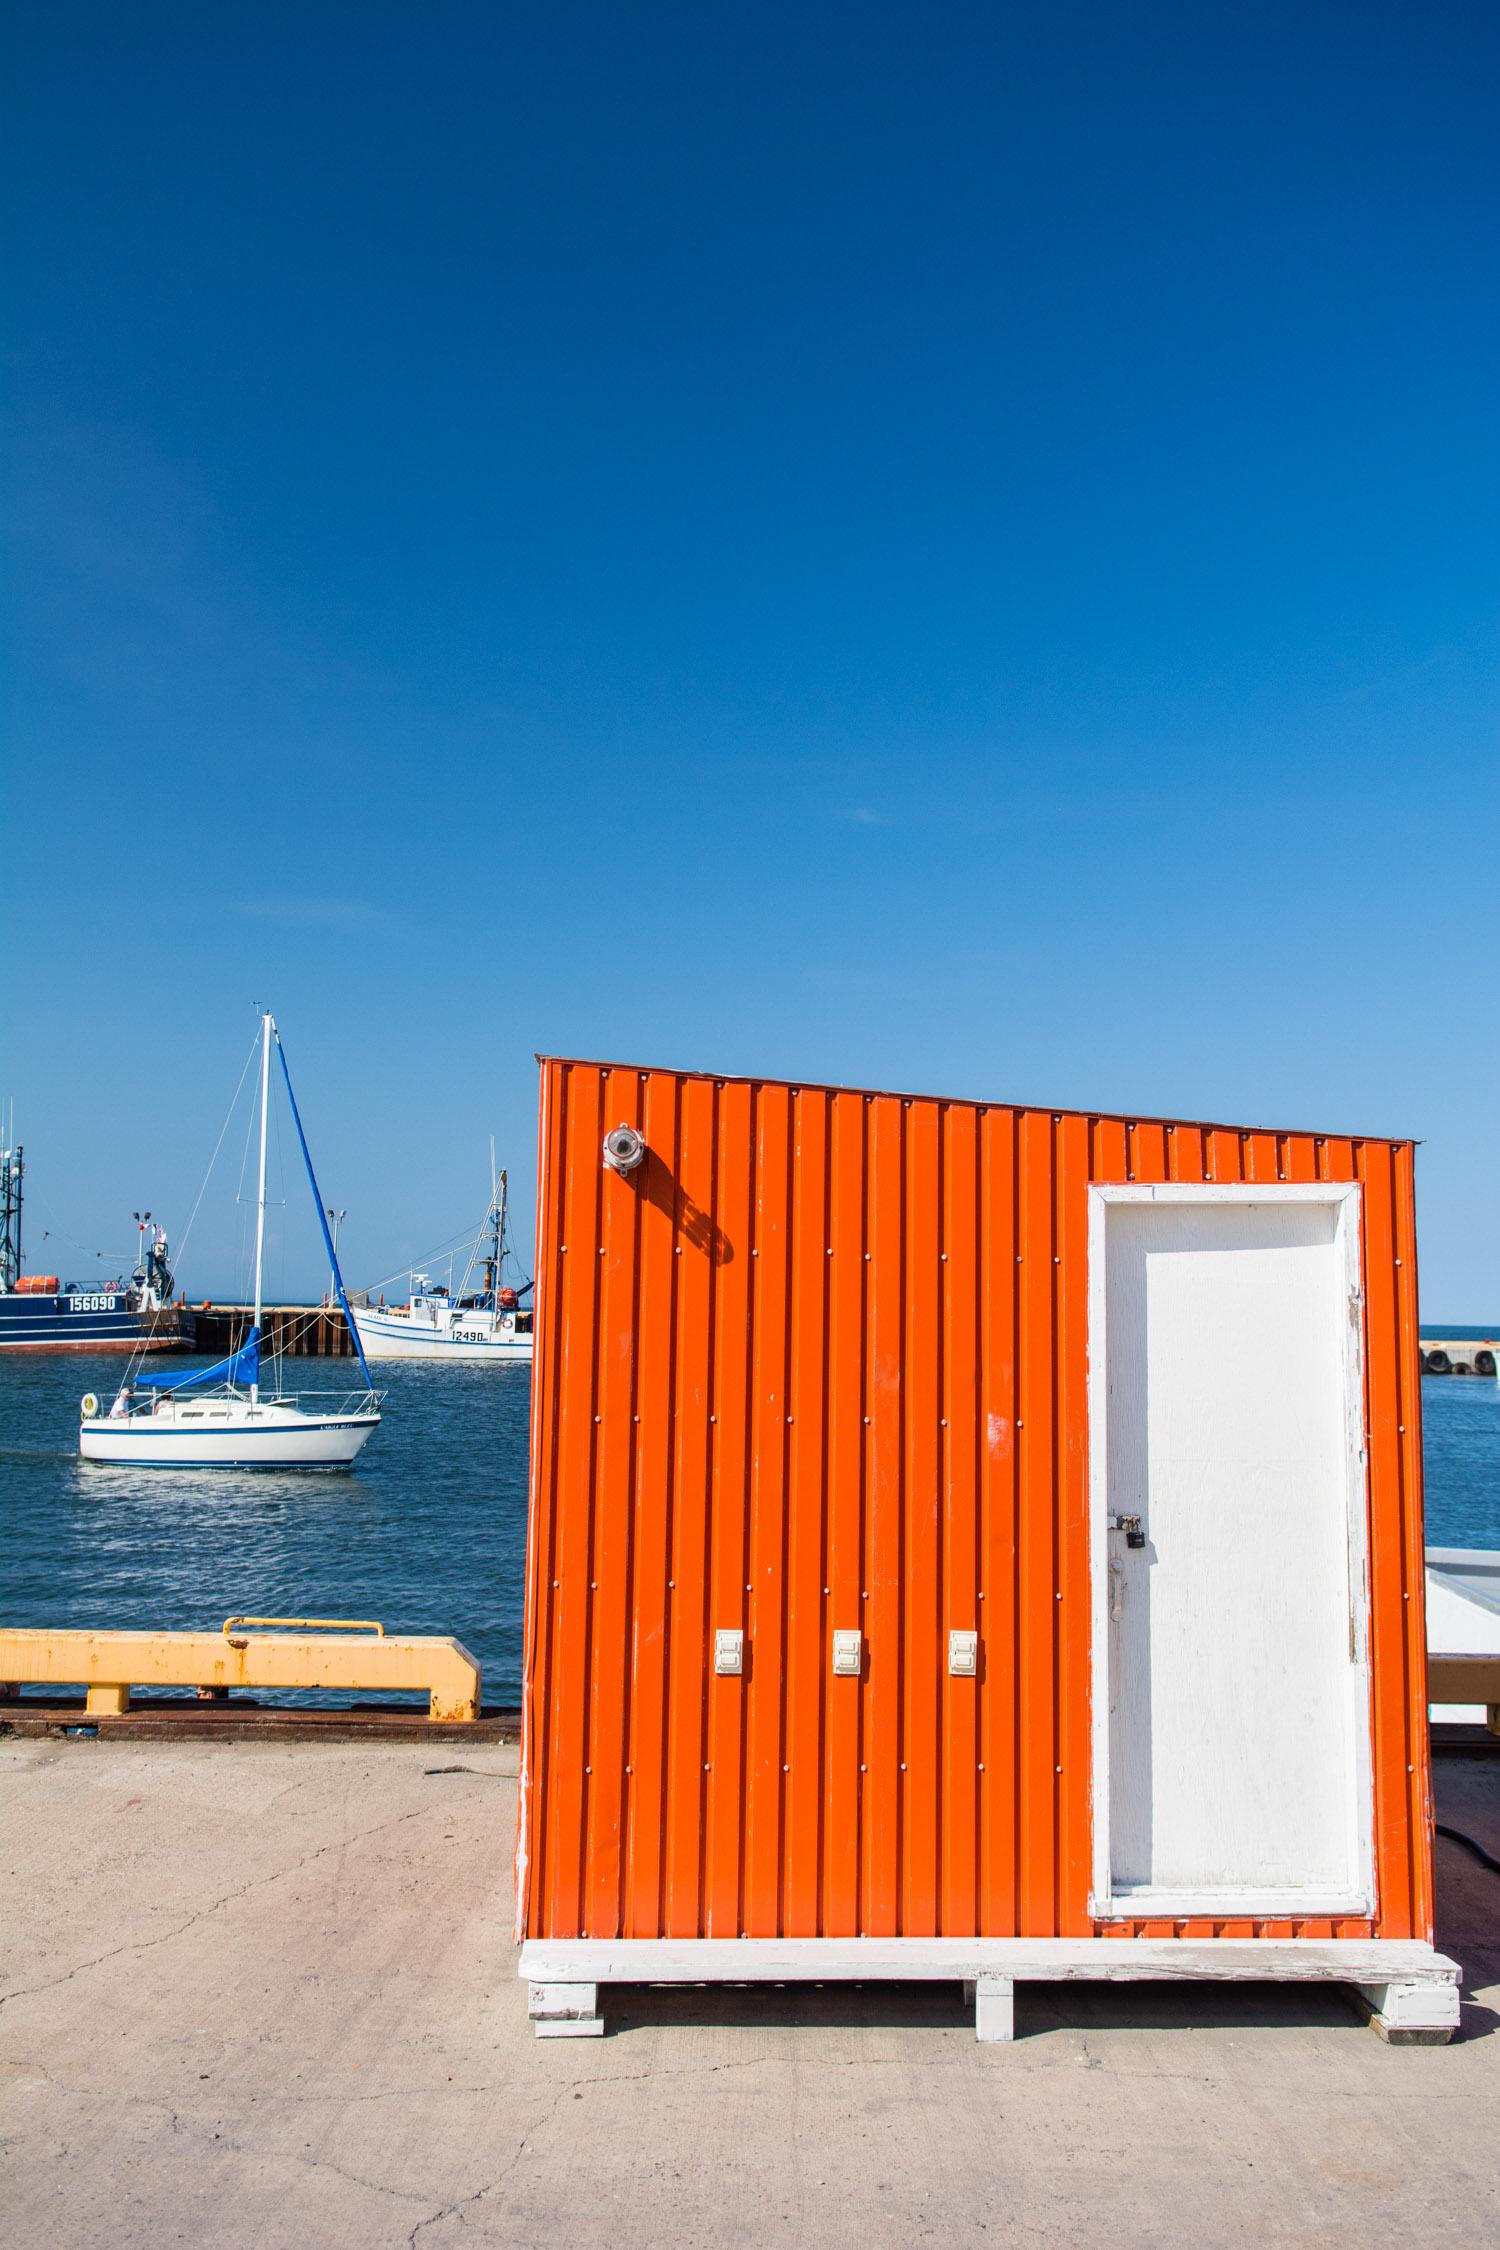 aug10-15 2014-Tourism New Brunswick-T4G Kick-summer 2014-Miramichi-Bathurst-Caraquet-Shippagan-Miscou Island-NB-web res jpg-photo by Aaron McKenzie Fraser-www.amfraser.com_AMF3378.jpg